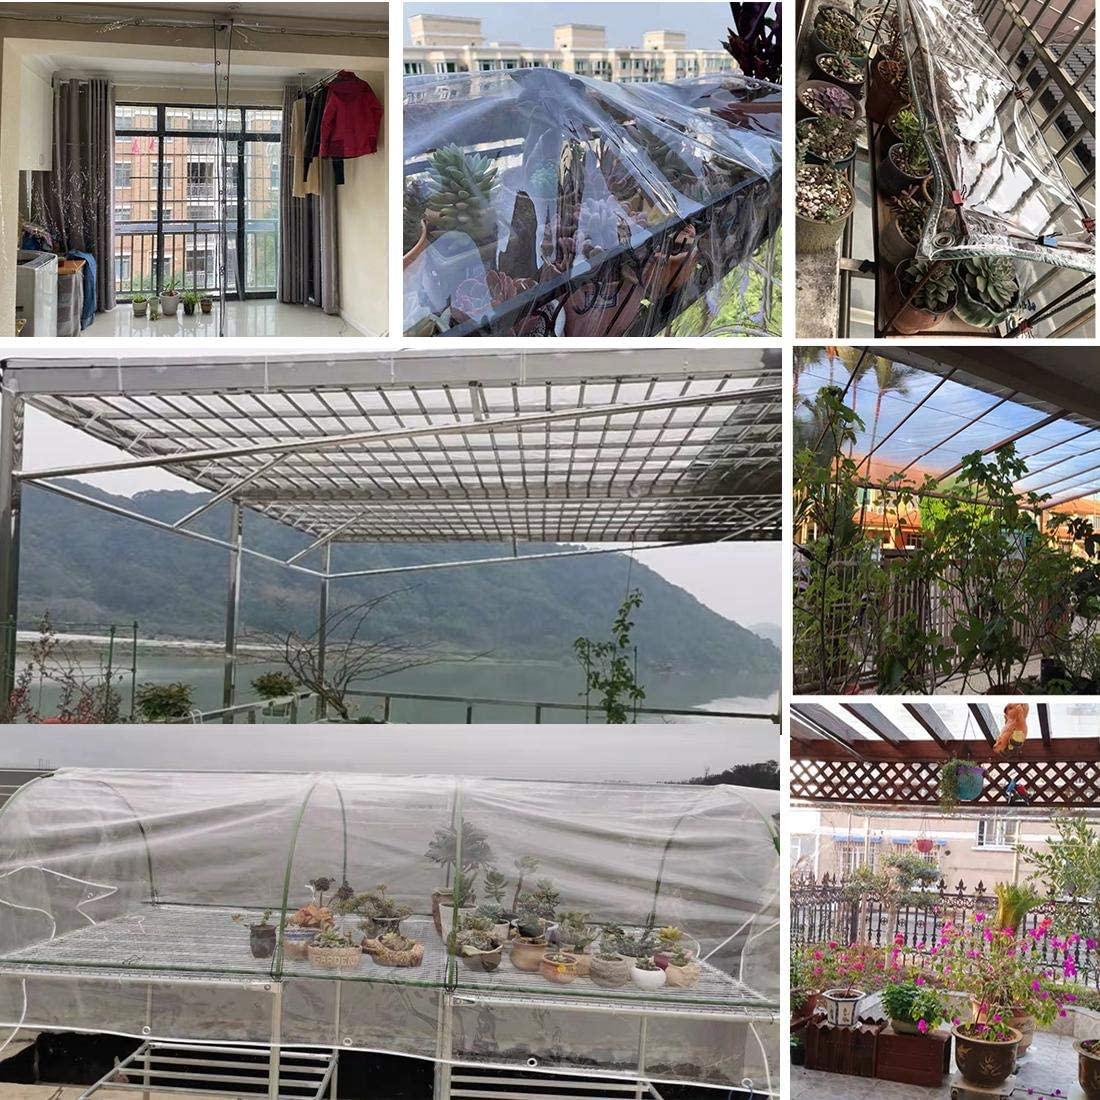 Waterproof Transparent PVC Tarpaulin With Eyelets Weatherproof Foldable 0.35mm Rain Cover Garden Furniture Plants Greenhouse Pet enlarge